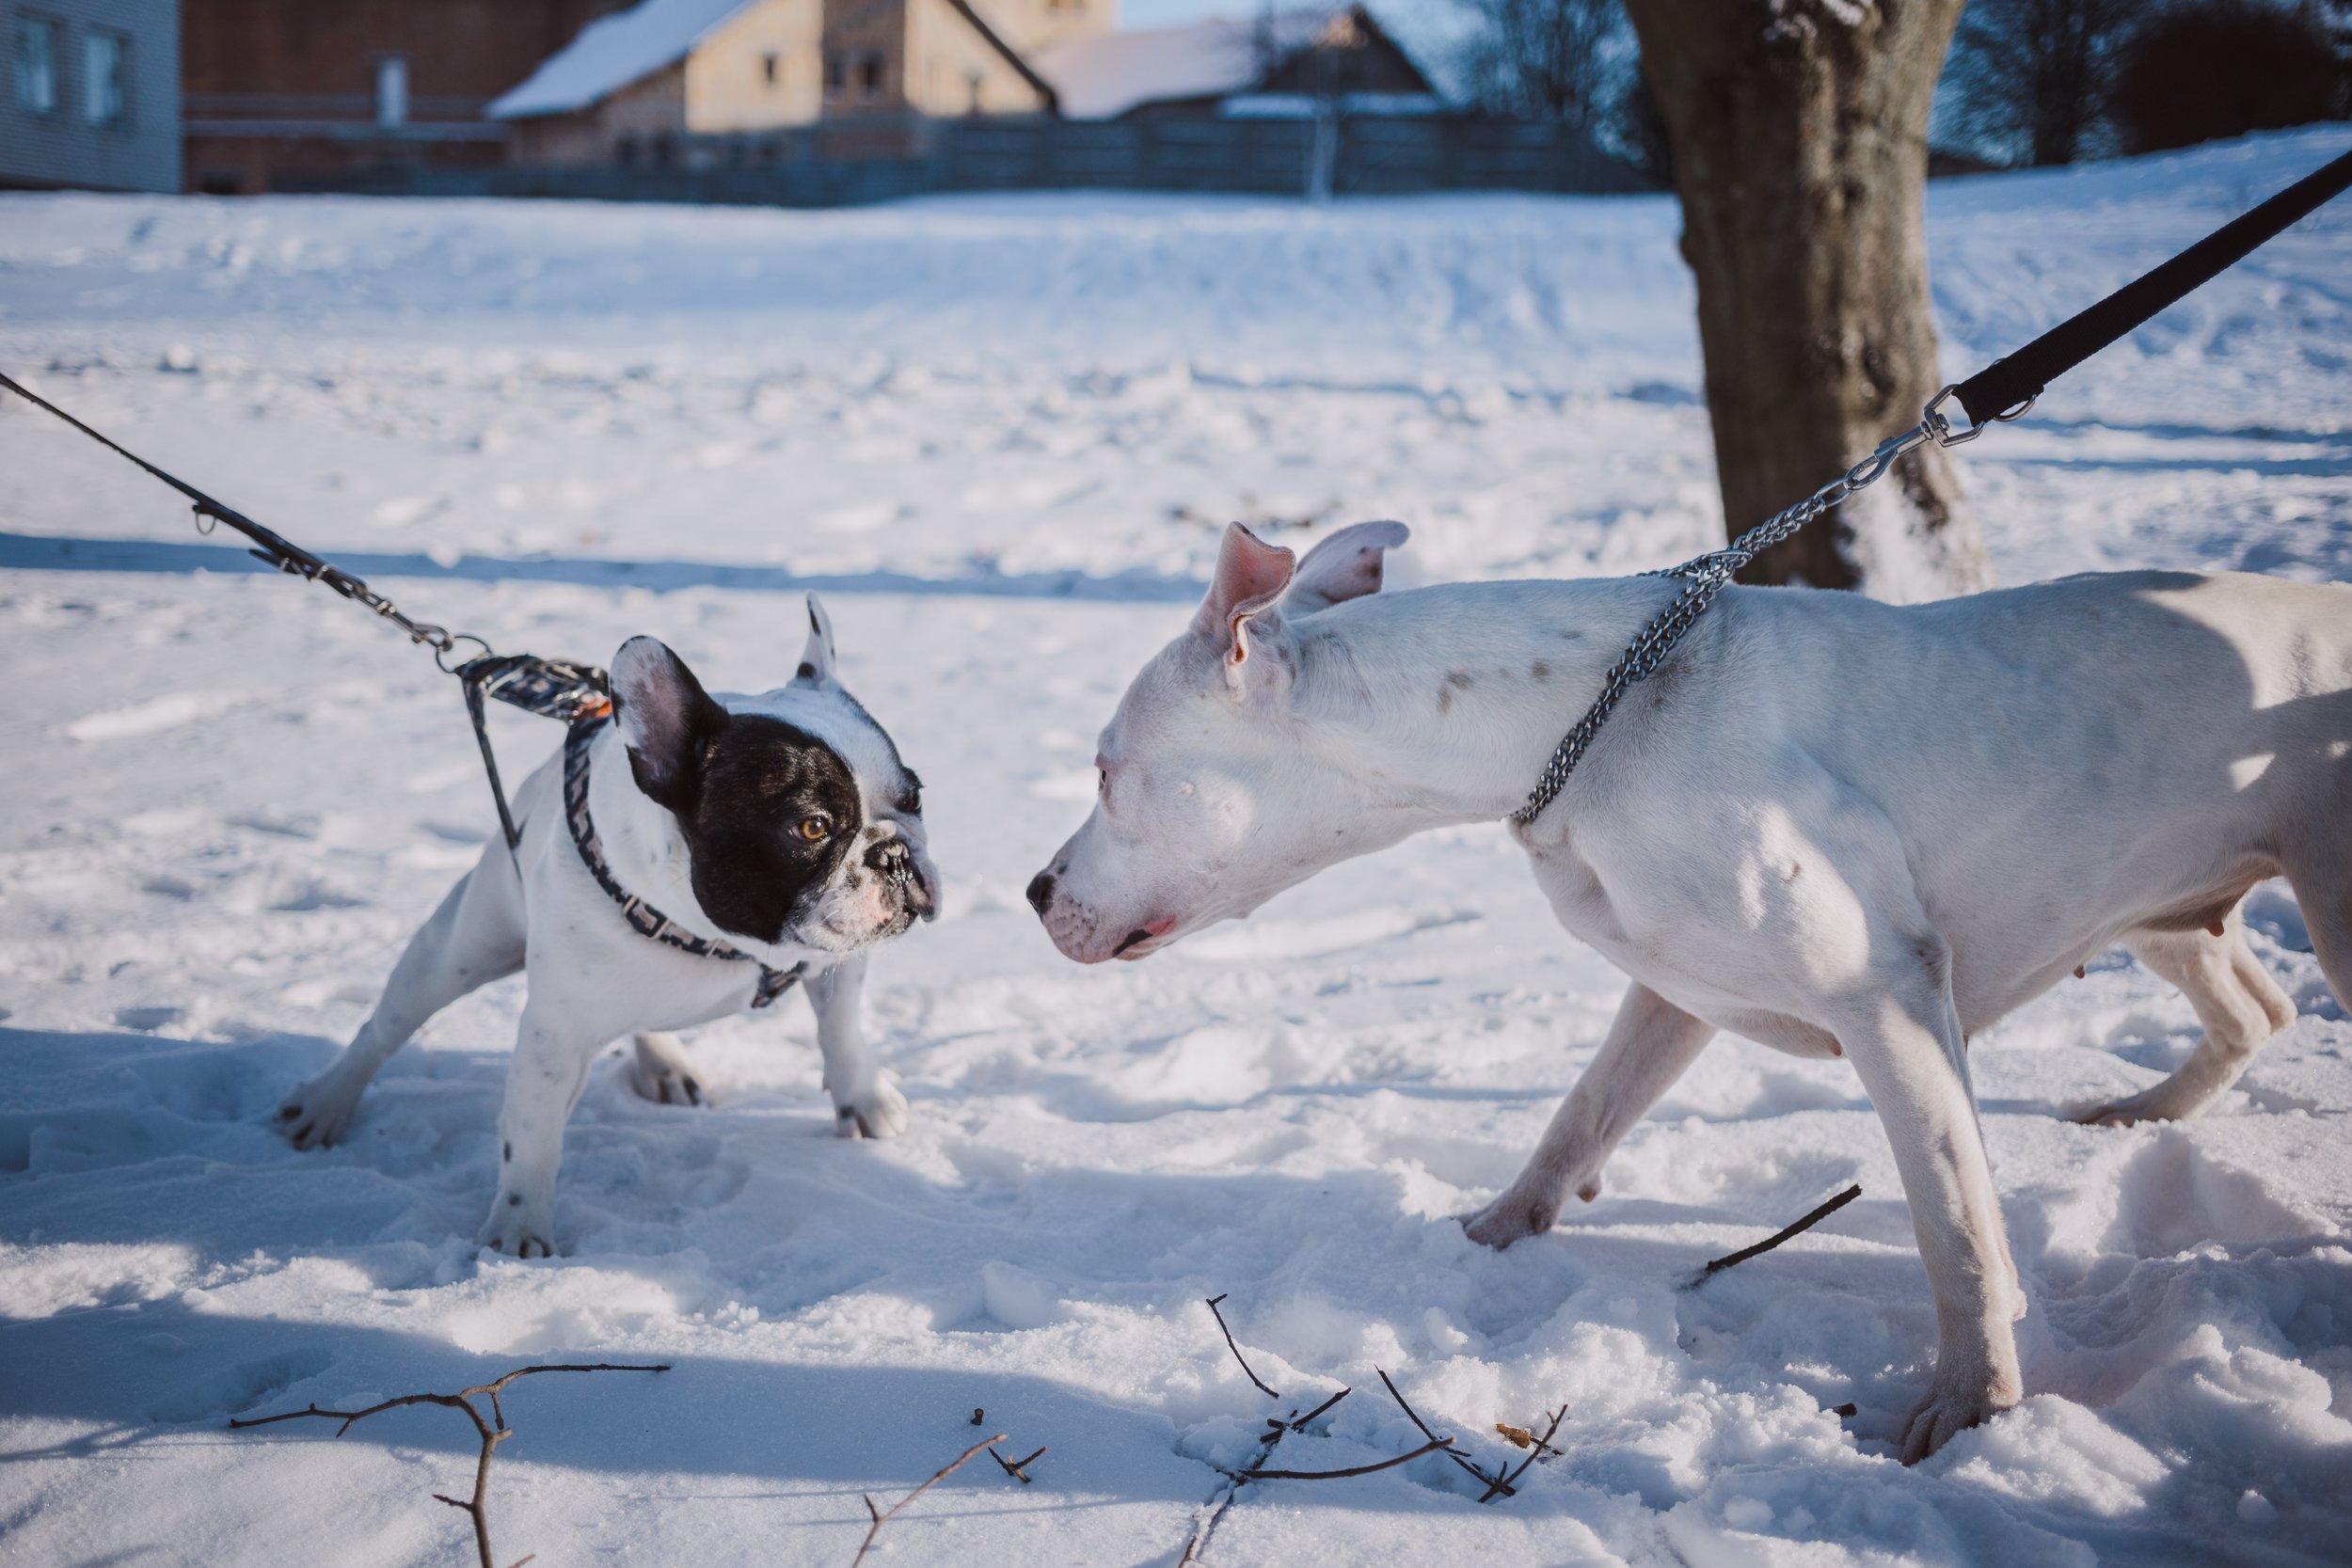 Homeward Bound Animal Care Dog Walking  National Dog Bite Prevention Week  Lakes Region NH